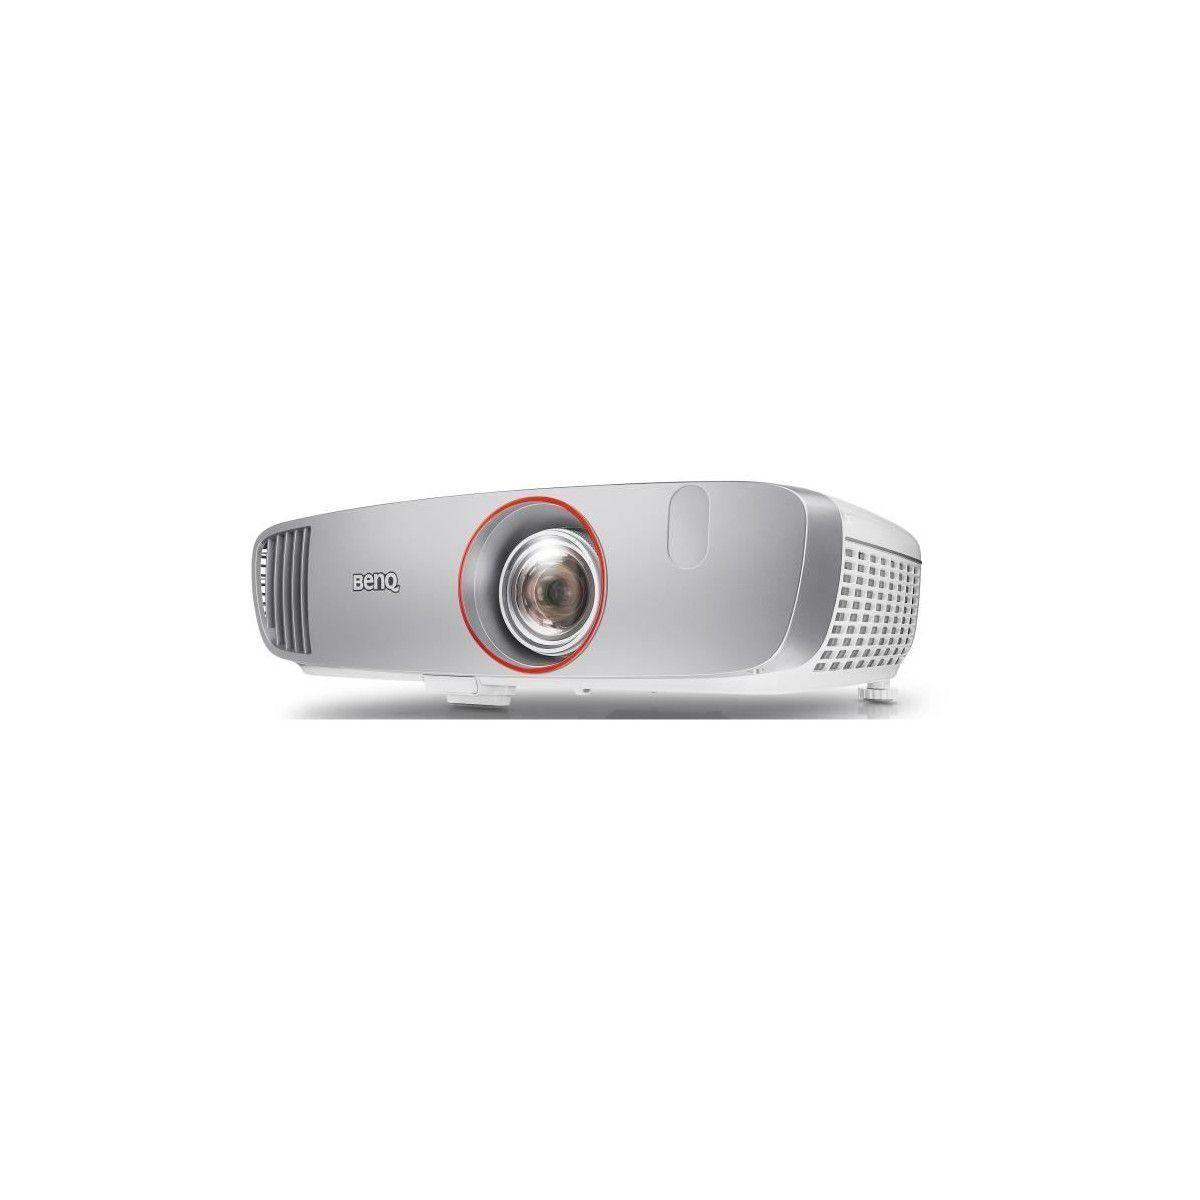 BENQ W1210ST Videoprojecteur Home Cinema Full HD a Focale Courte